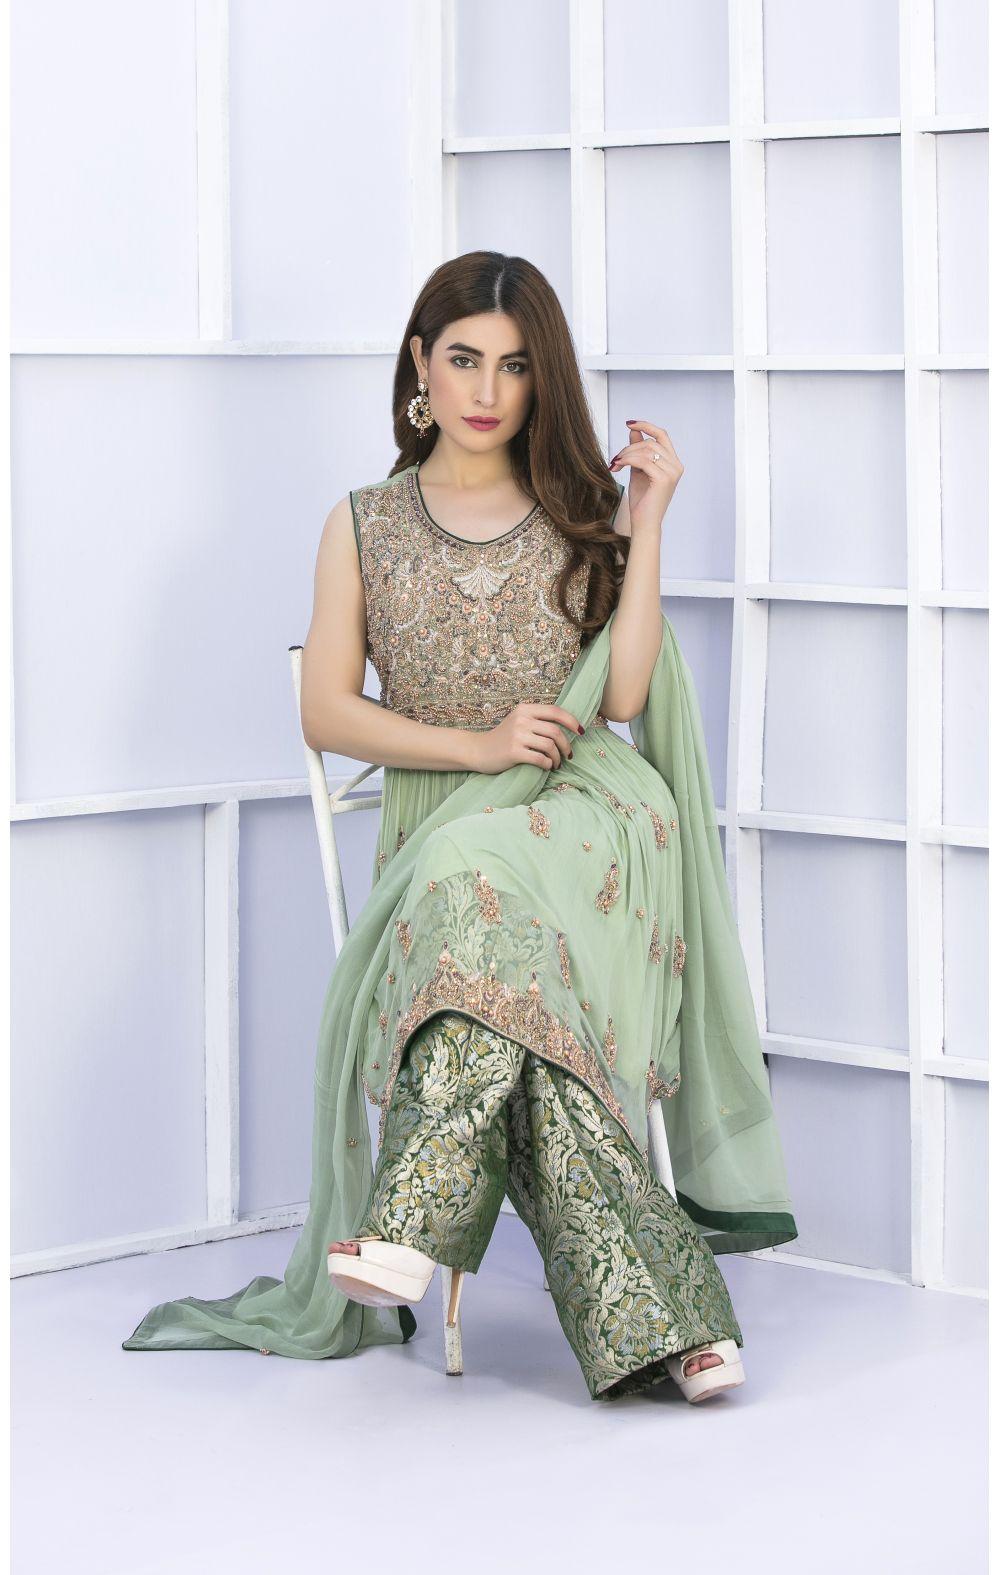 Buy Exclusive Pista Green And Bottle Green Bridal Wear – G15127 Online In USA, Uk & Pakistan - 02